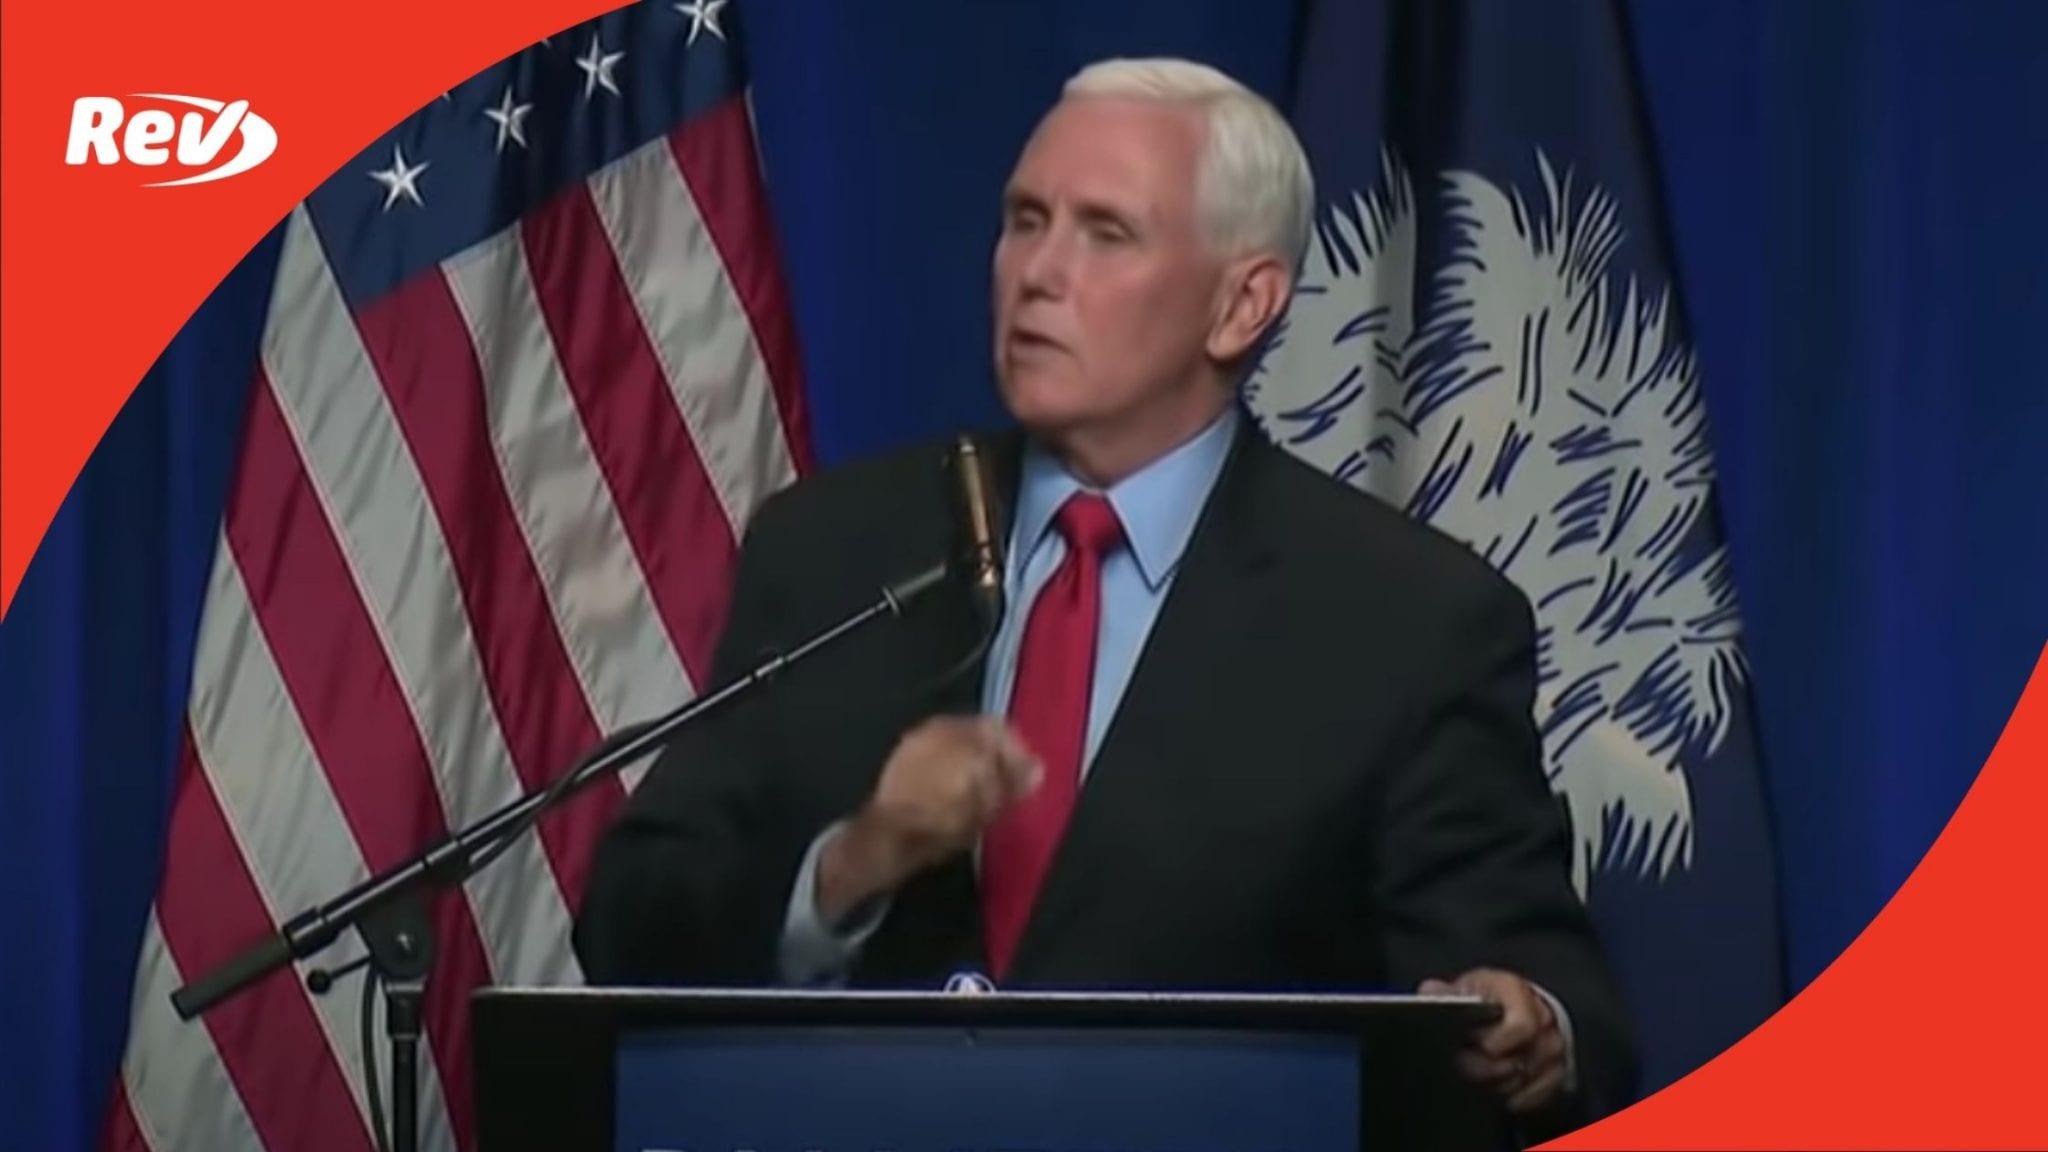 Mike Pence Speech Transcript April 29: First Speech Since Leaving Office